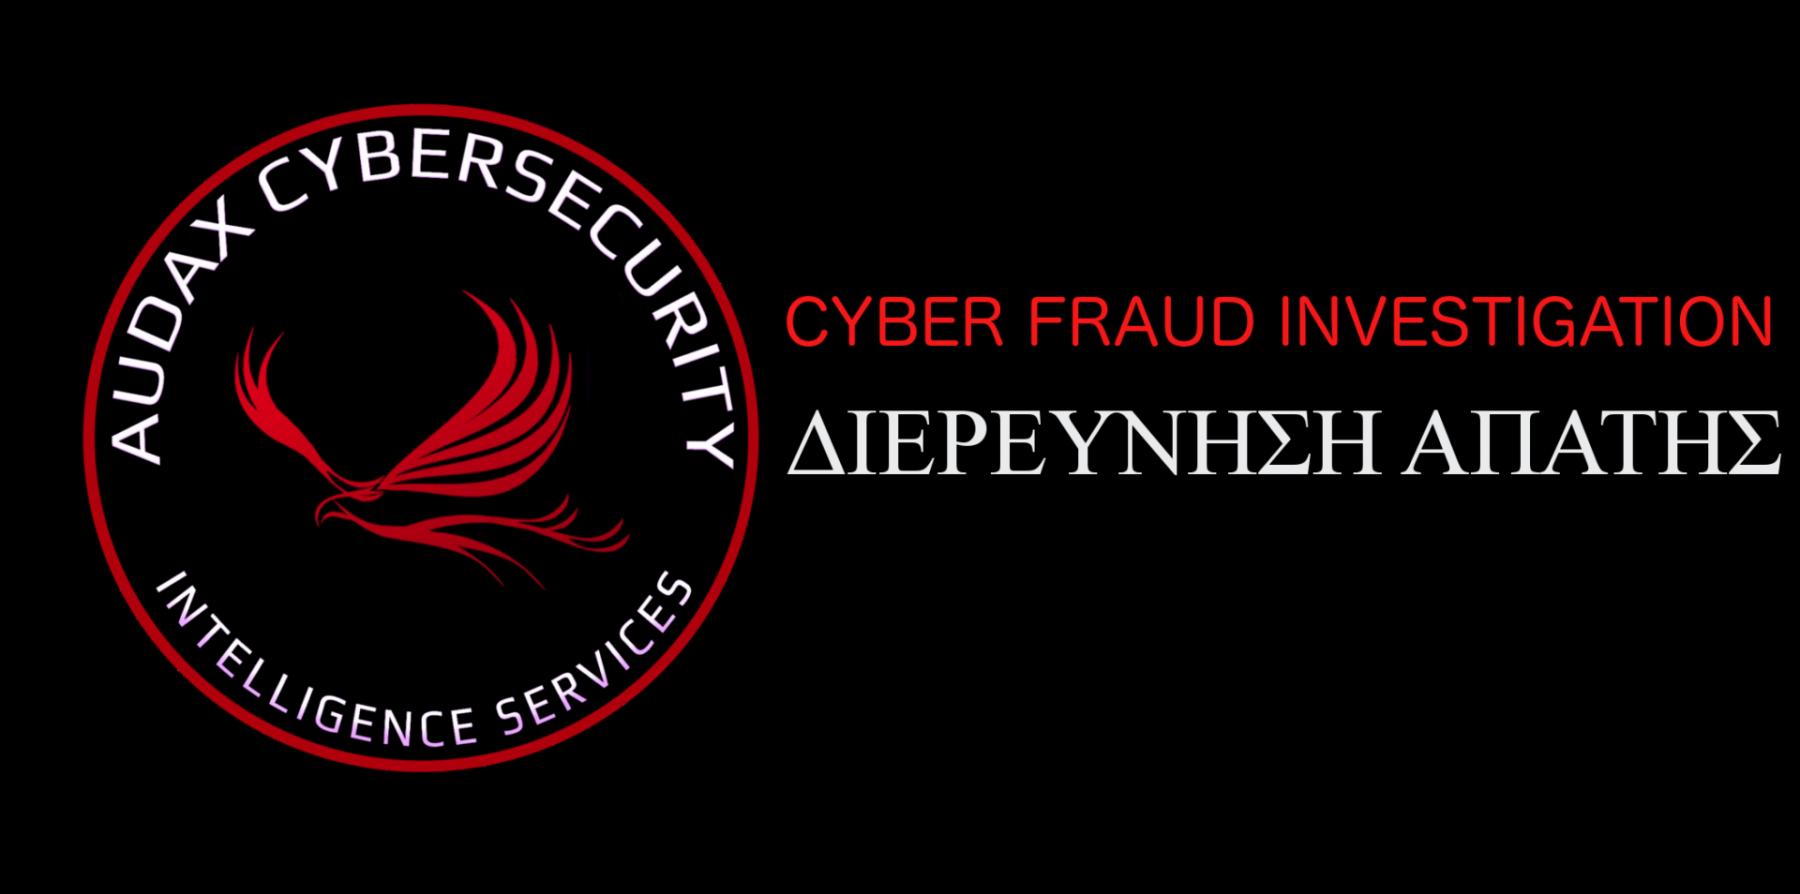 Cyber_Fraud_Investigation-1920x1371